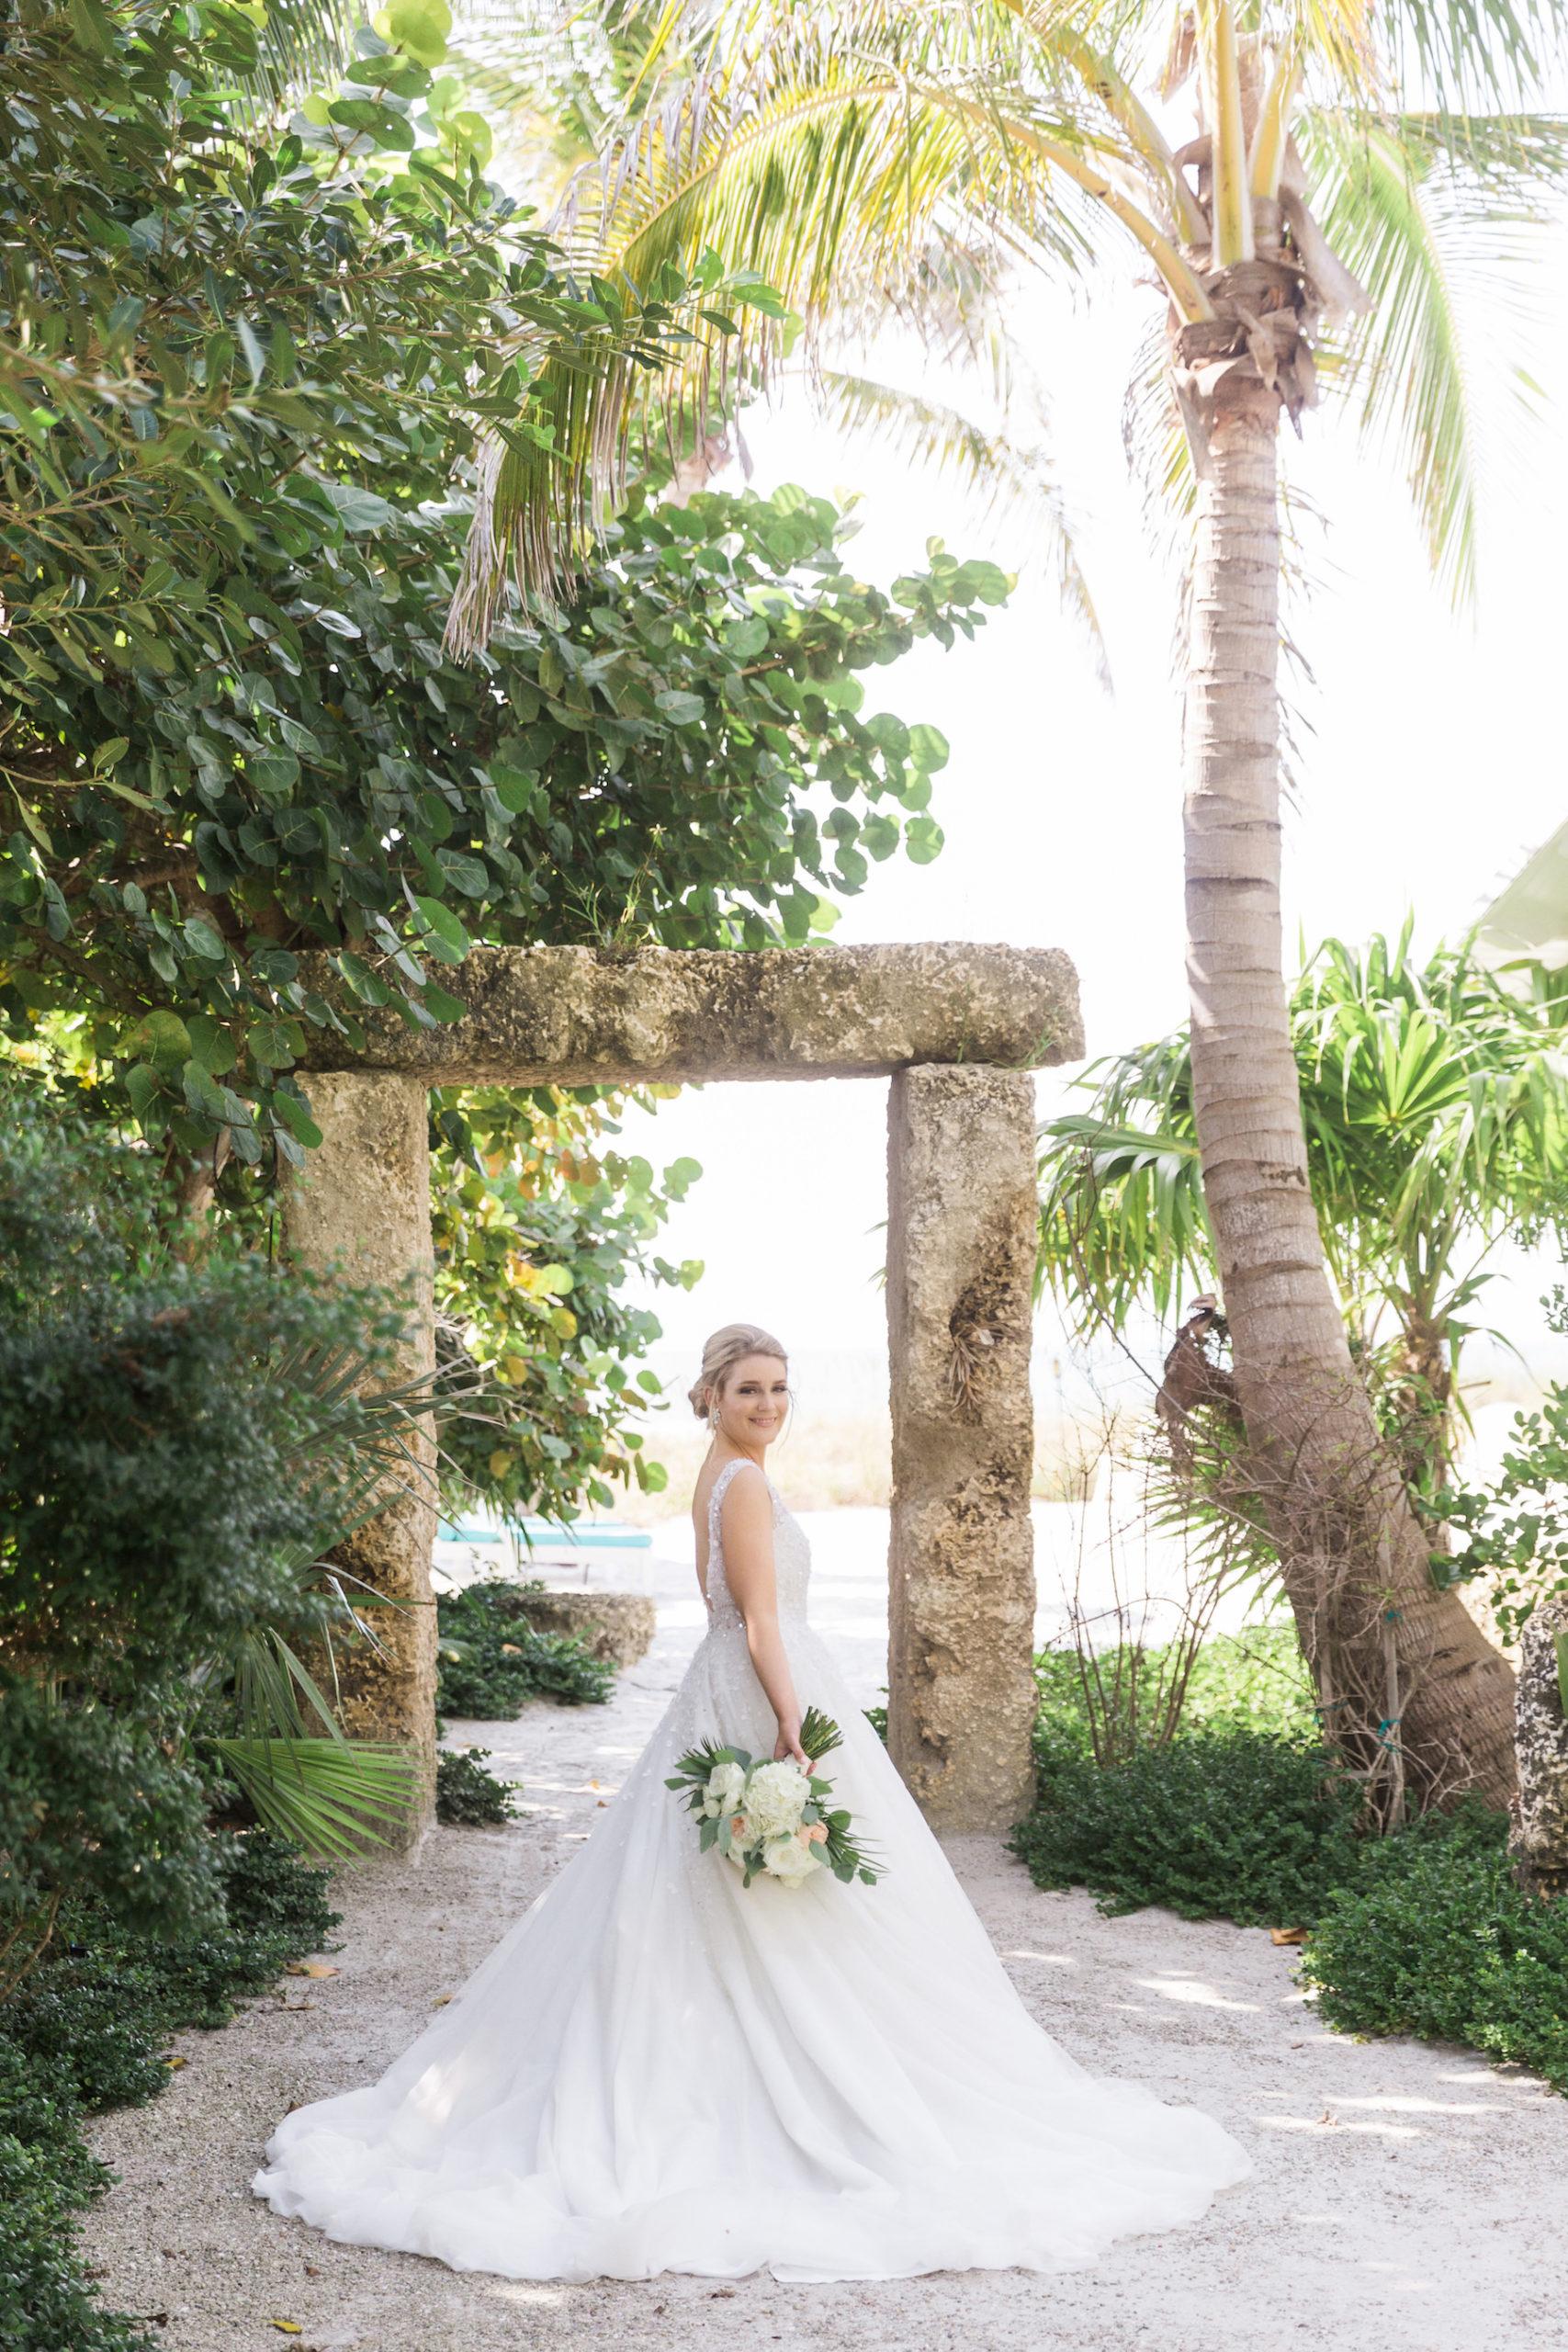 Nicole Spose A-Line Wedding Dress with Embellishments | Tropical Sarasota Florida Wedding